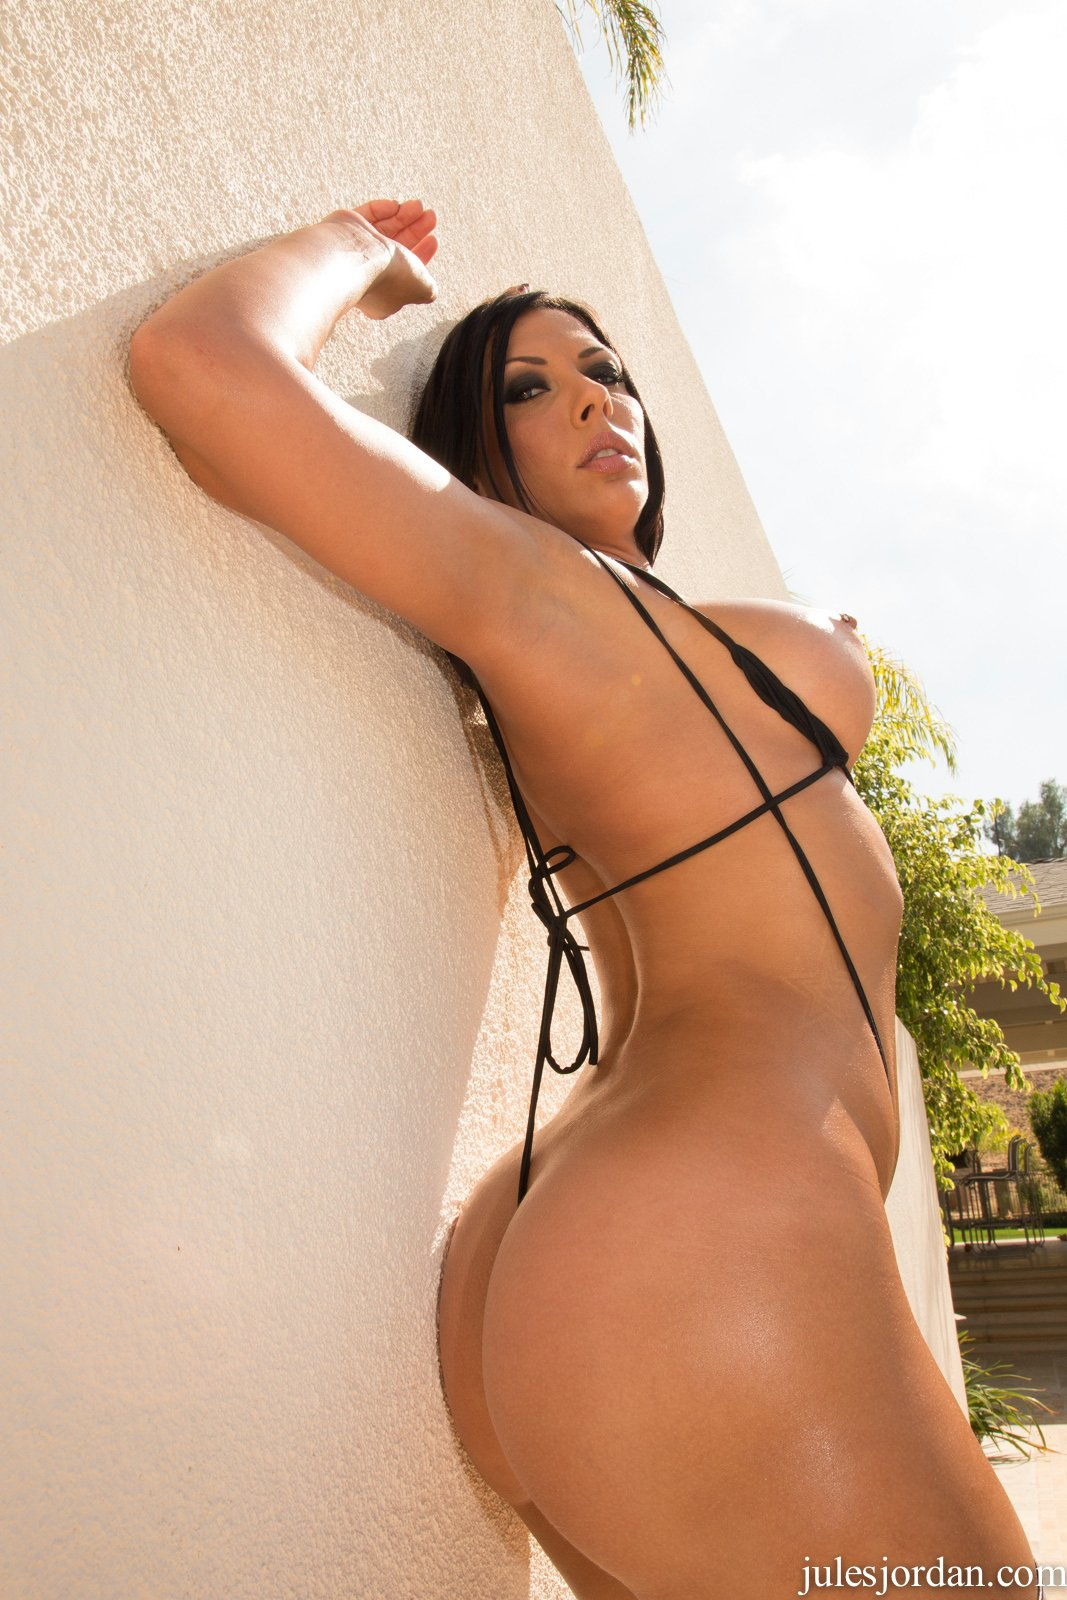 Rachel Starr Jules Jordan Official Pornstar Website